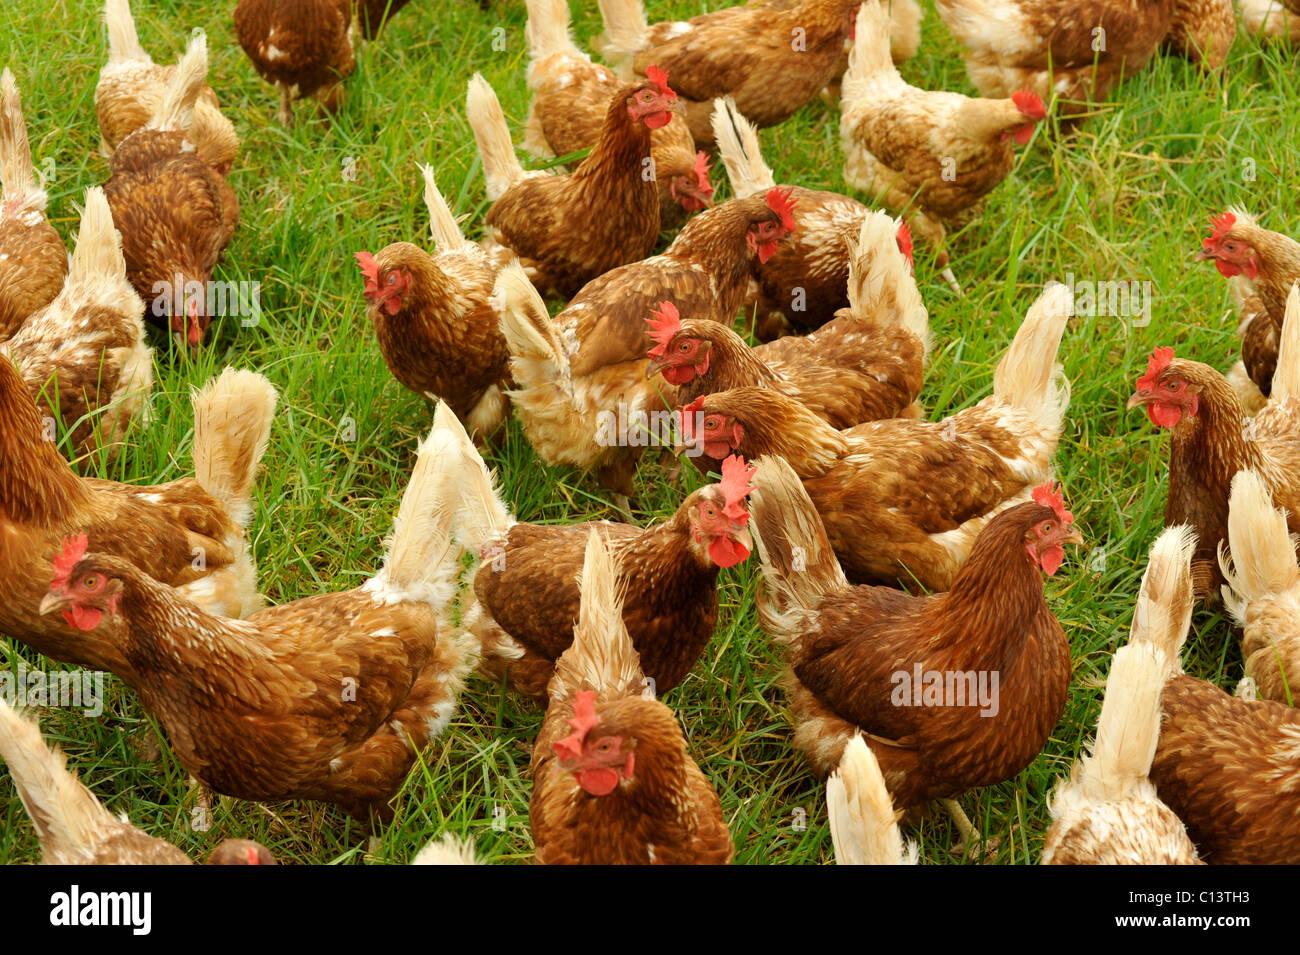 Free-range chickens - Stock Image